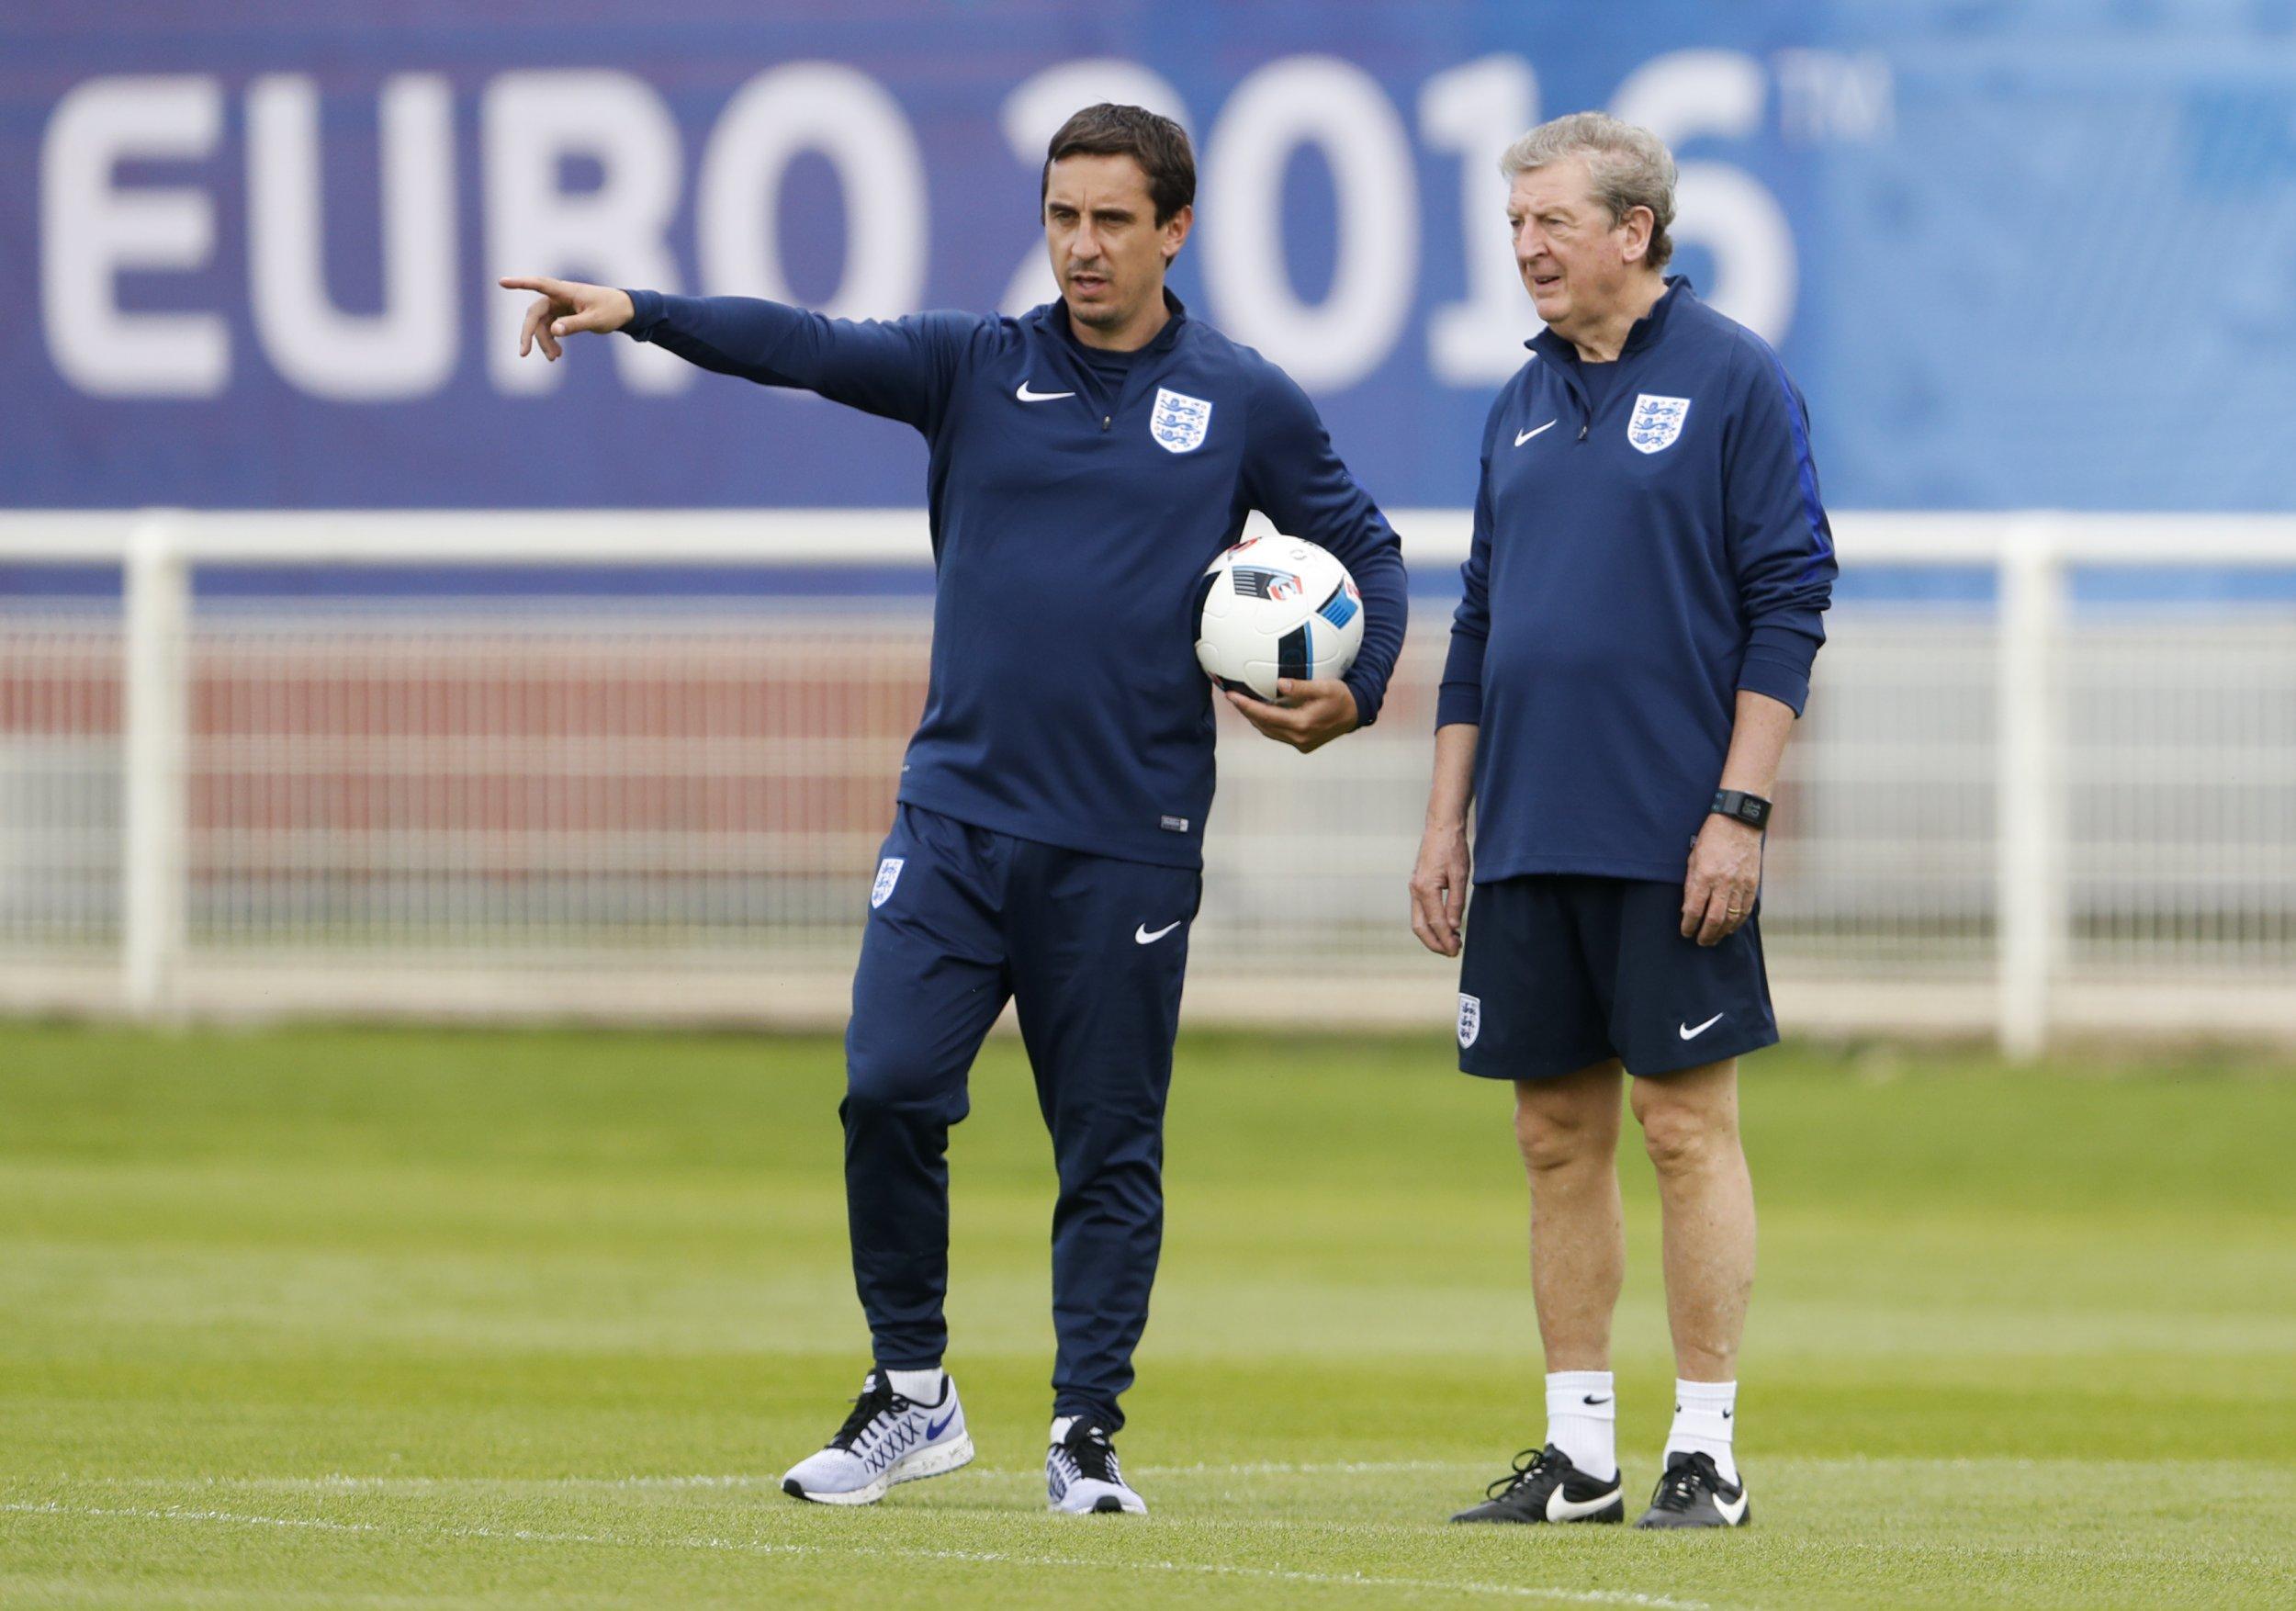 Neville and Hodgson